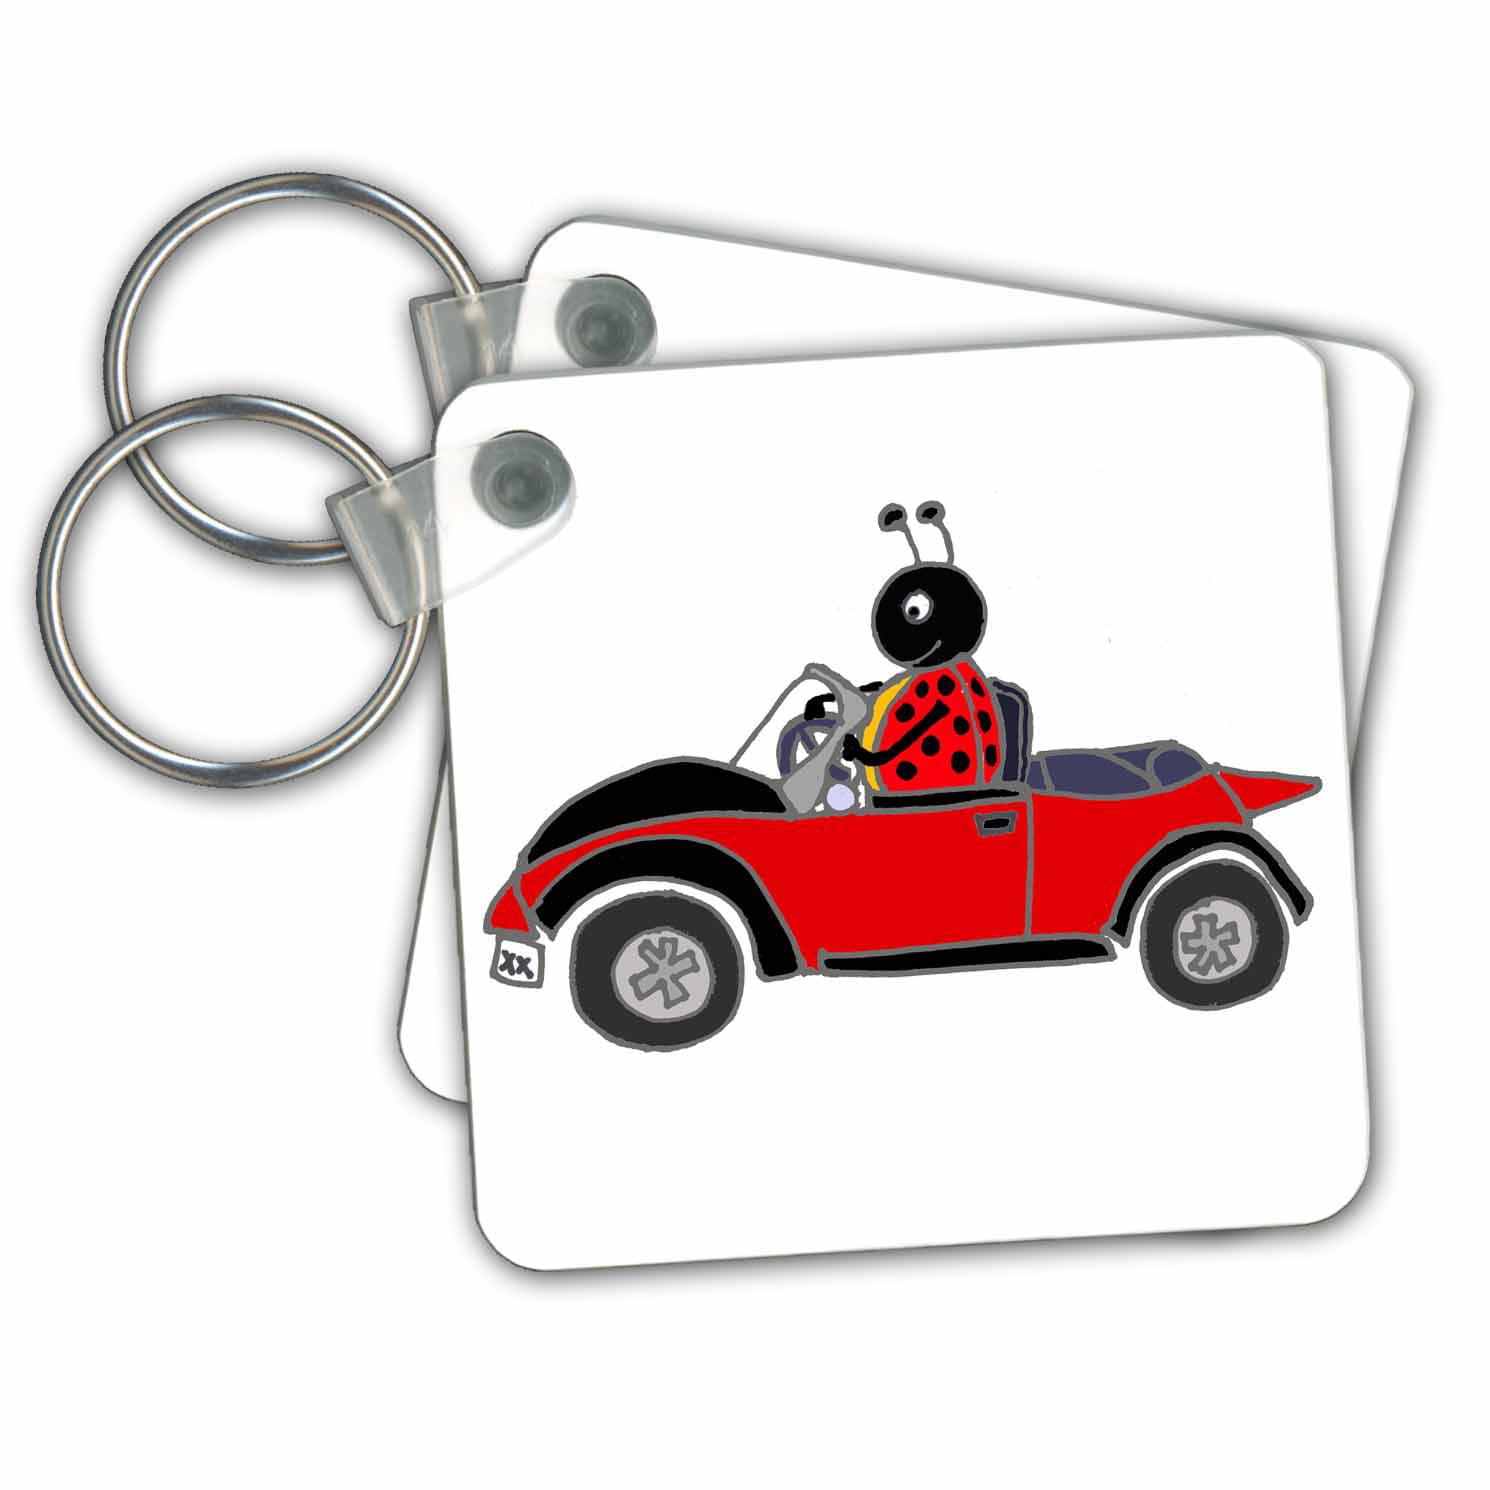 3drose 3drose Funny Ladybug Driving Black And Red Convertible Bug Cartoon Key Chains 2 25 By 2 25 Inch Set Of 2 Walmart Com Walmart Com